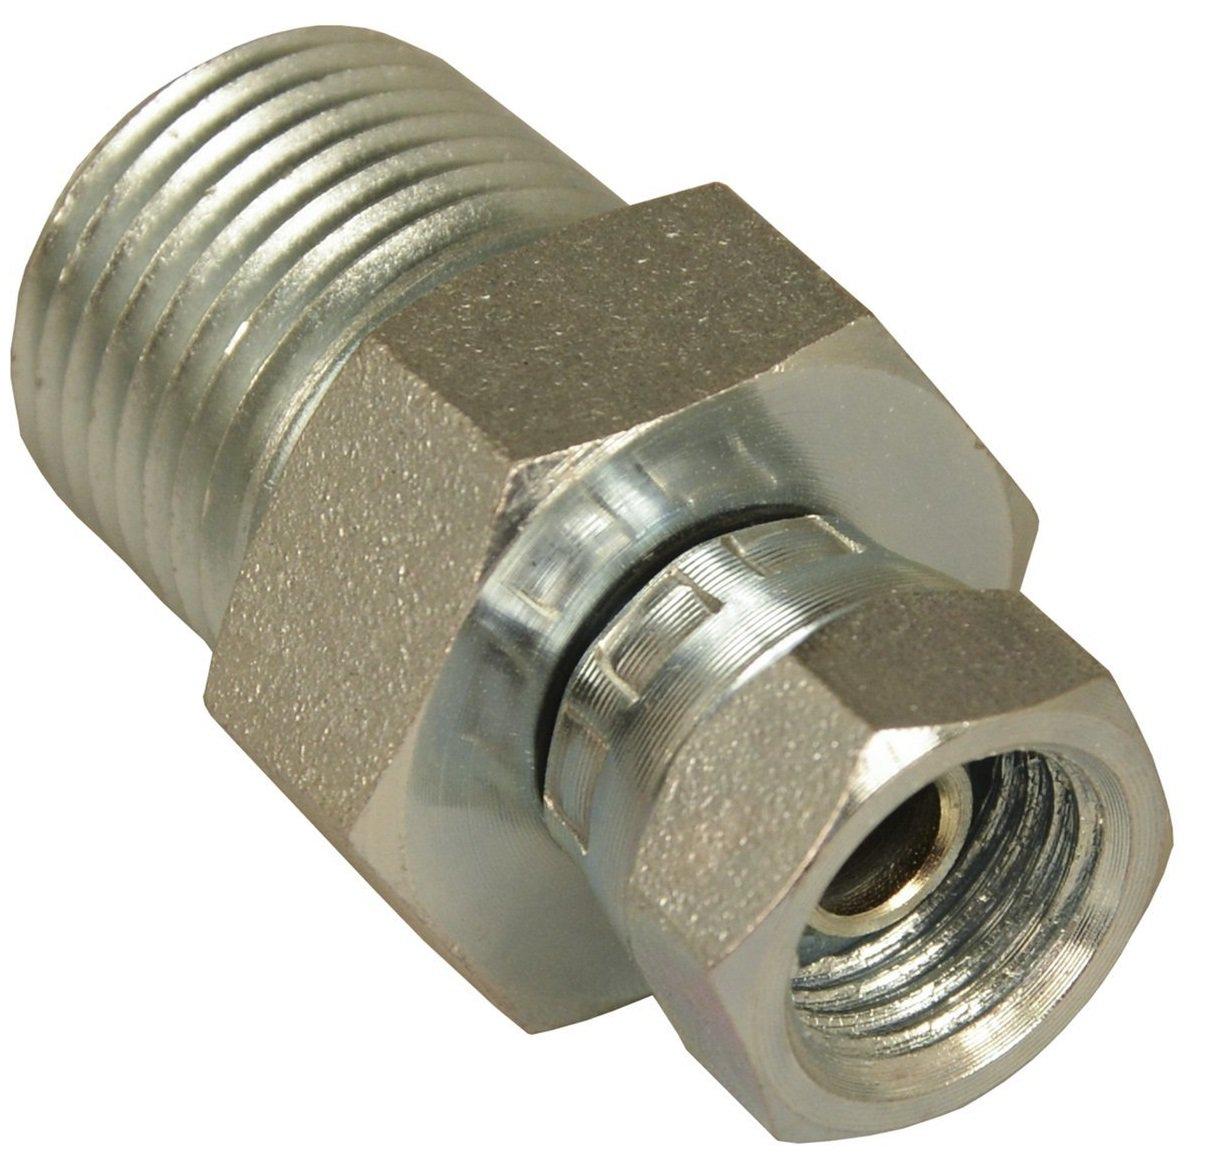 "APACHE HOSE & BELTING INC 39004325 1/2"" Male Pipe x 1/4"" Female Pipe Swivel, Hydraulic Adapter"